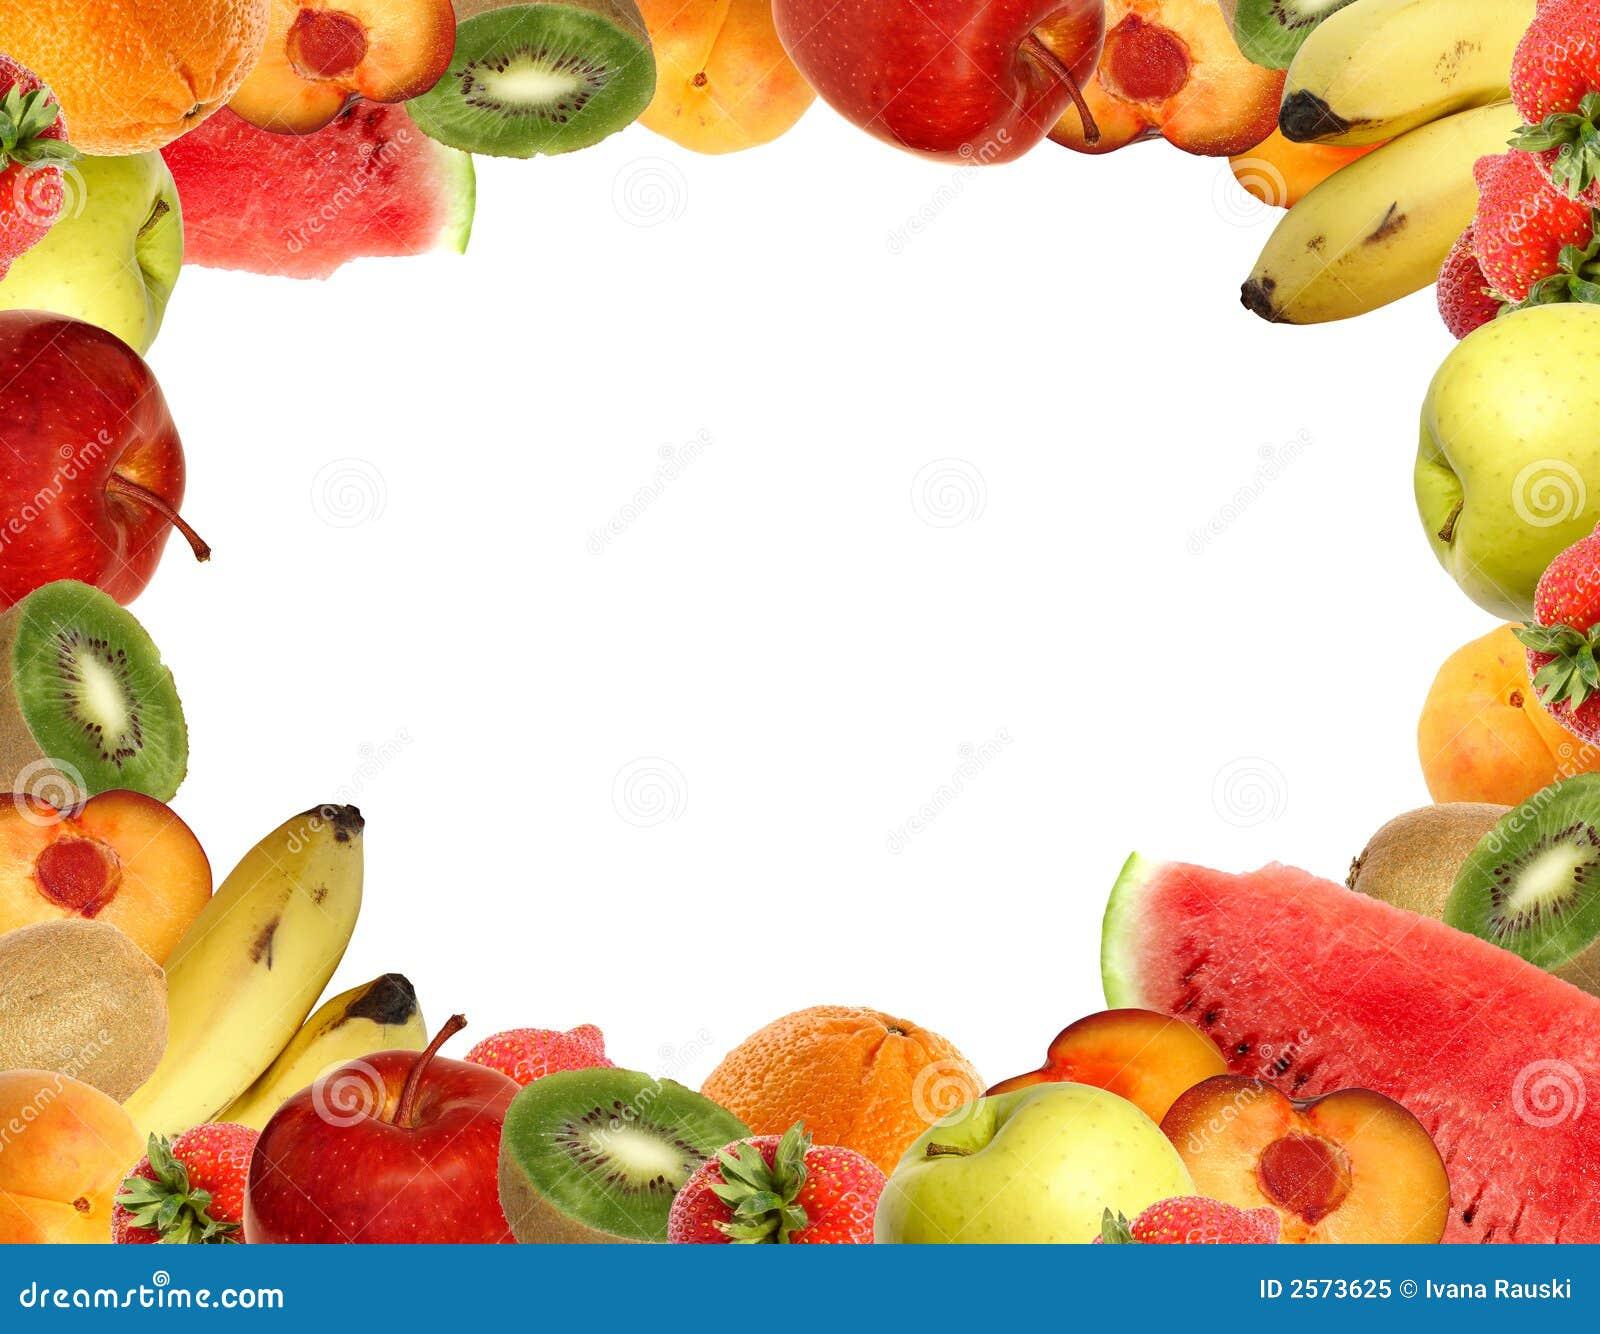 E House Plans Fruit Frame Royalty Free Stock Photo Image 2573625